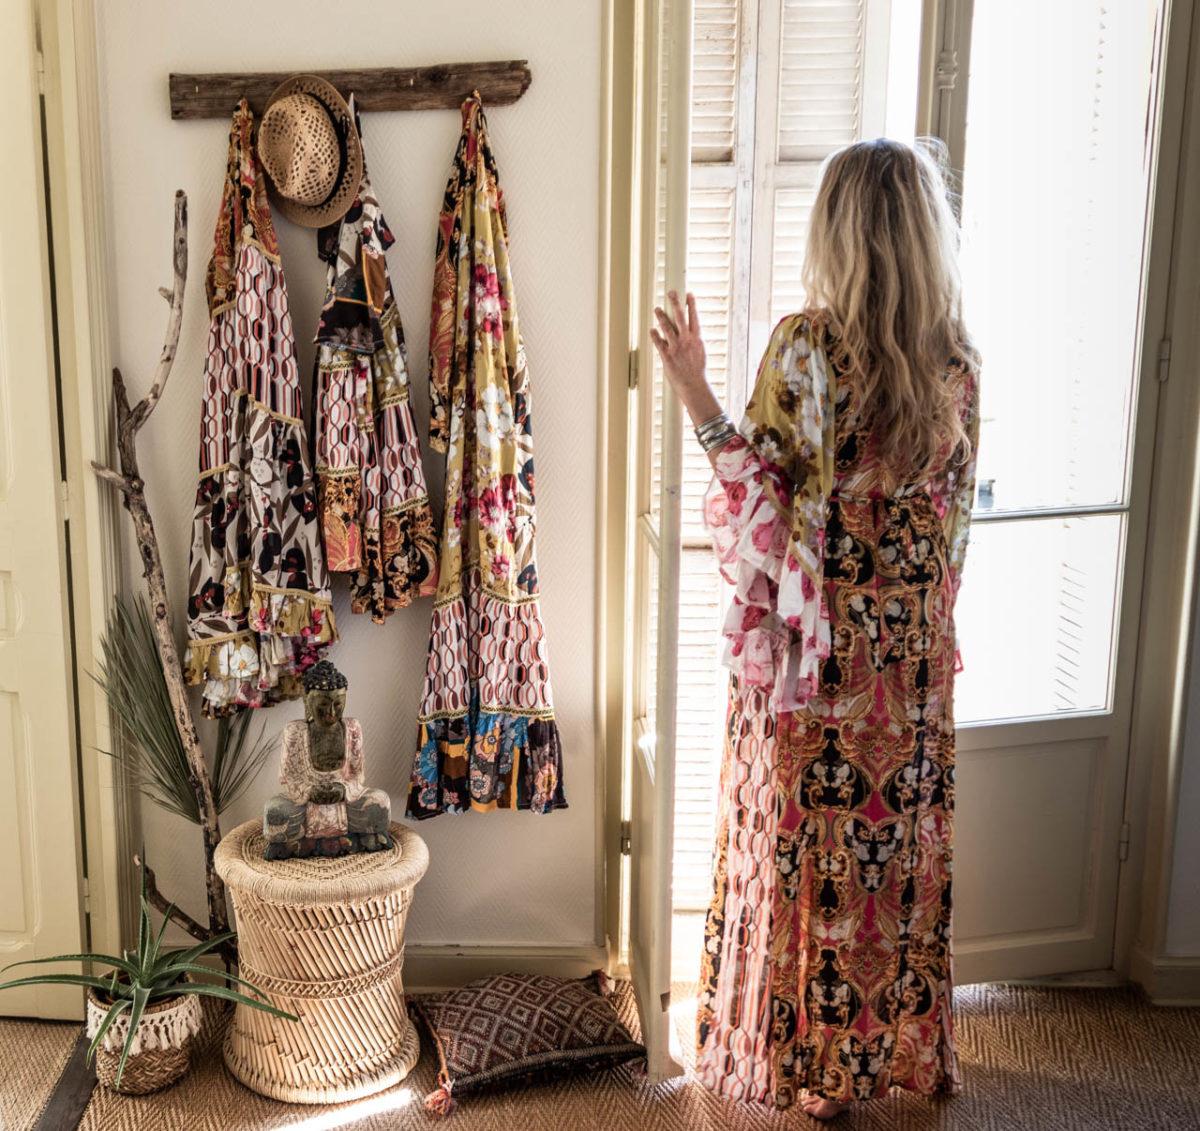 Zeitgeist Living sunny day & colourful Shahe lele dresses